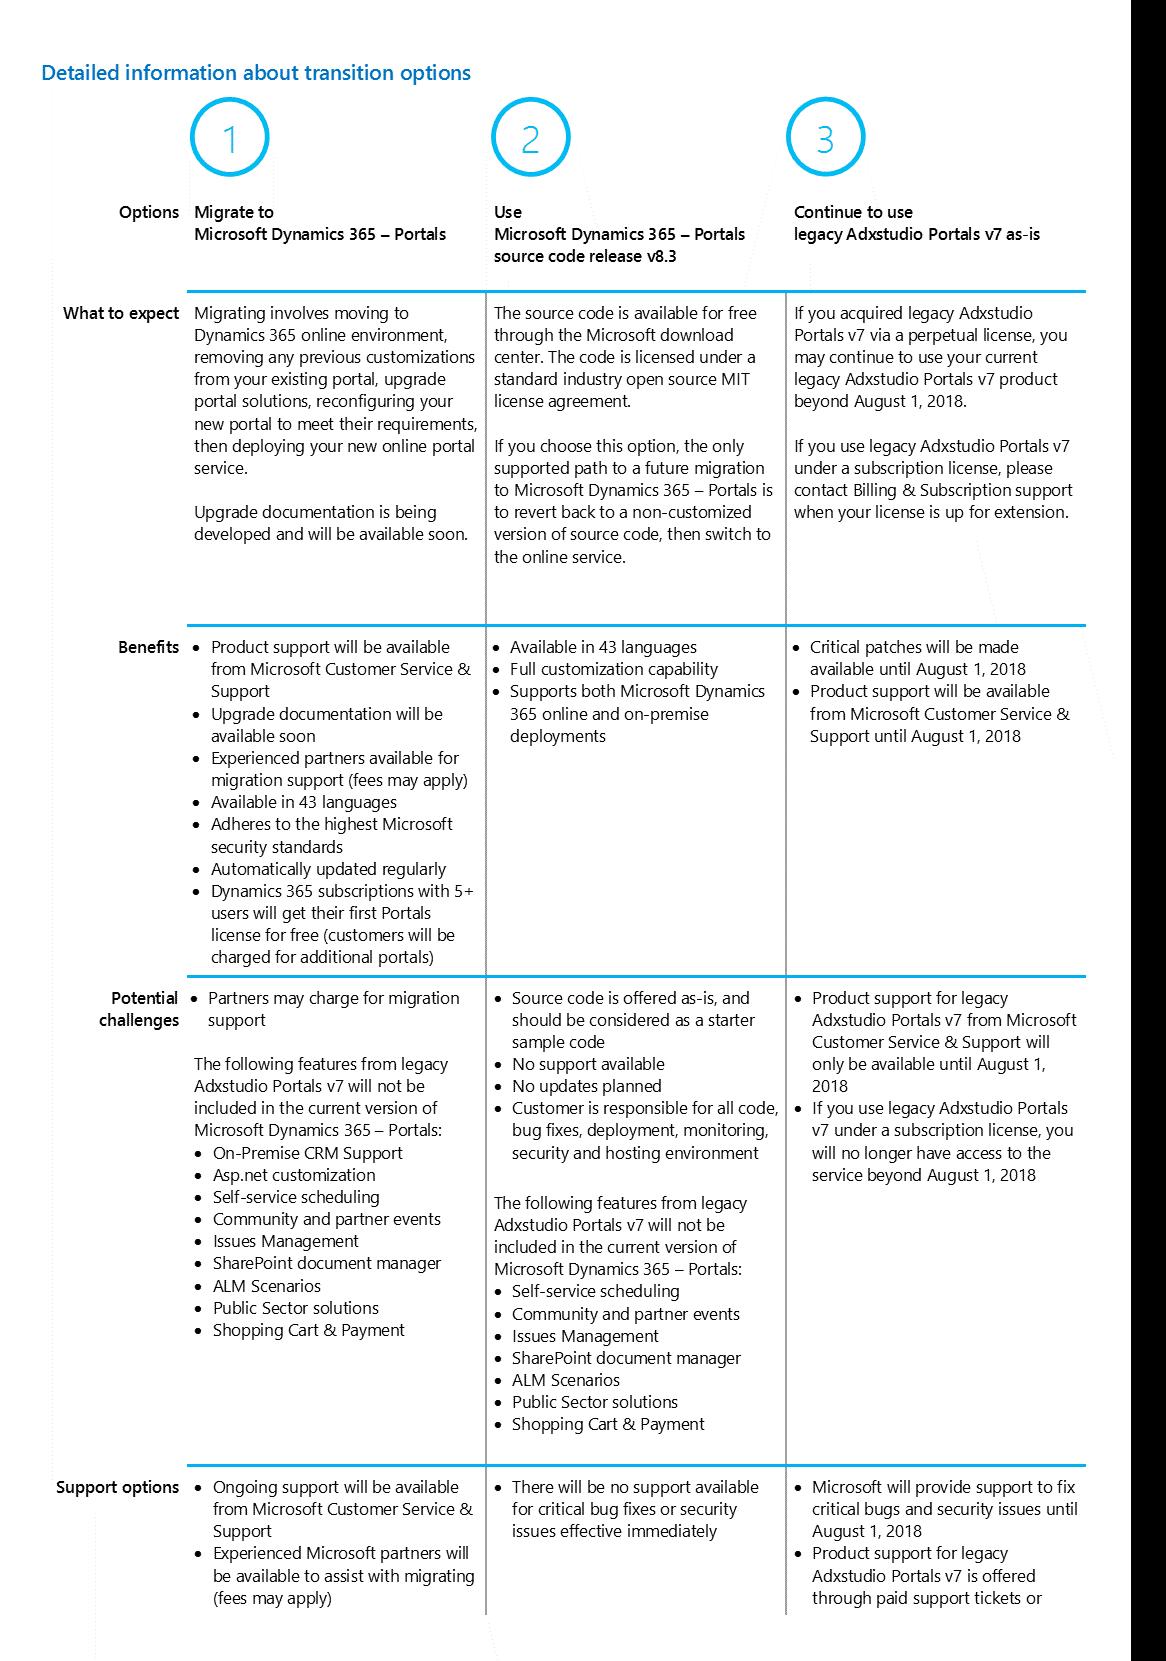 Upcoming changes to legacy Adxstudio Portals v7 - Dynamics 365 Blog